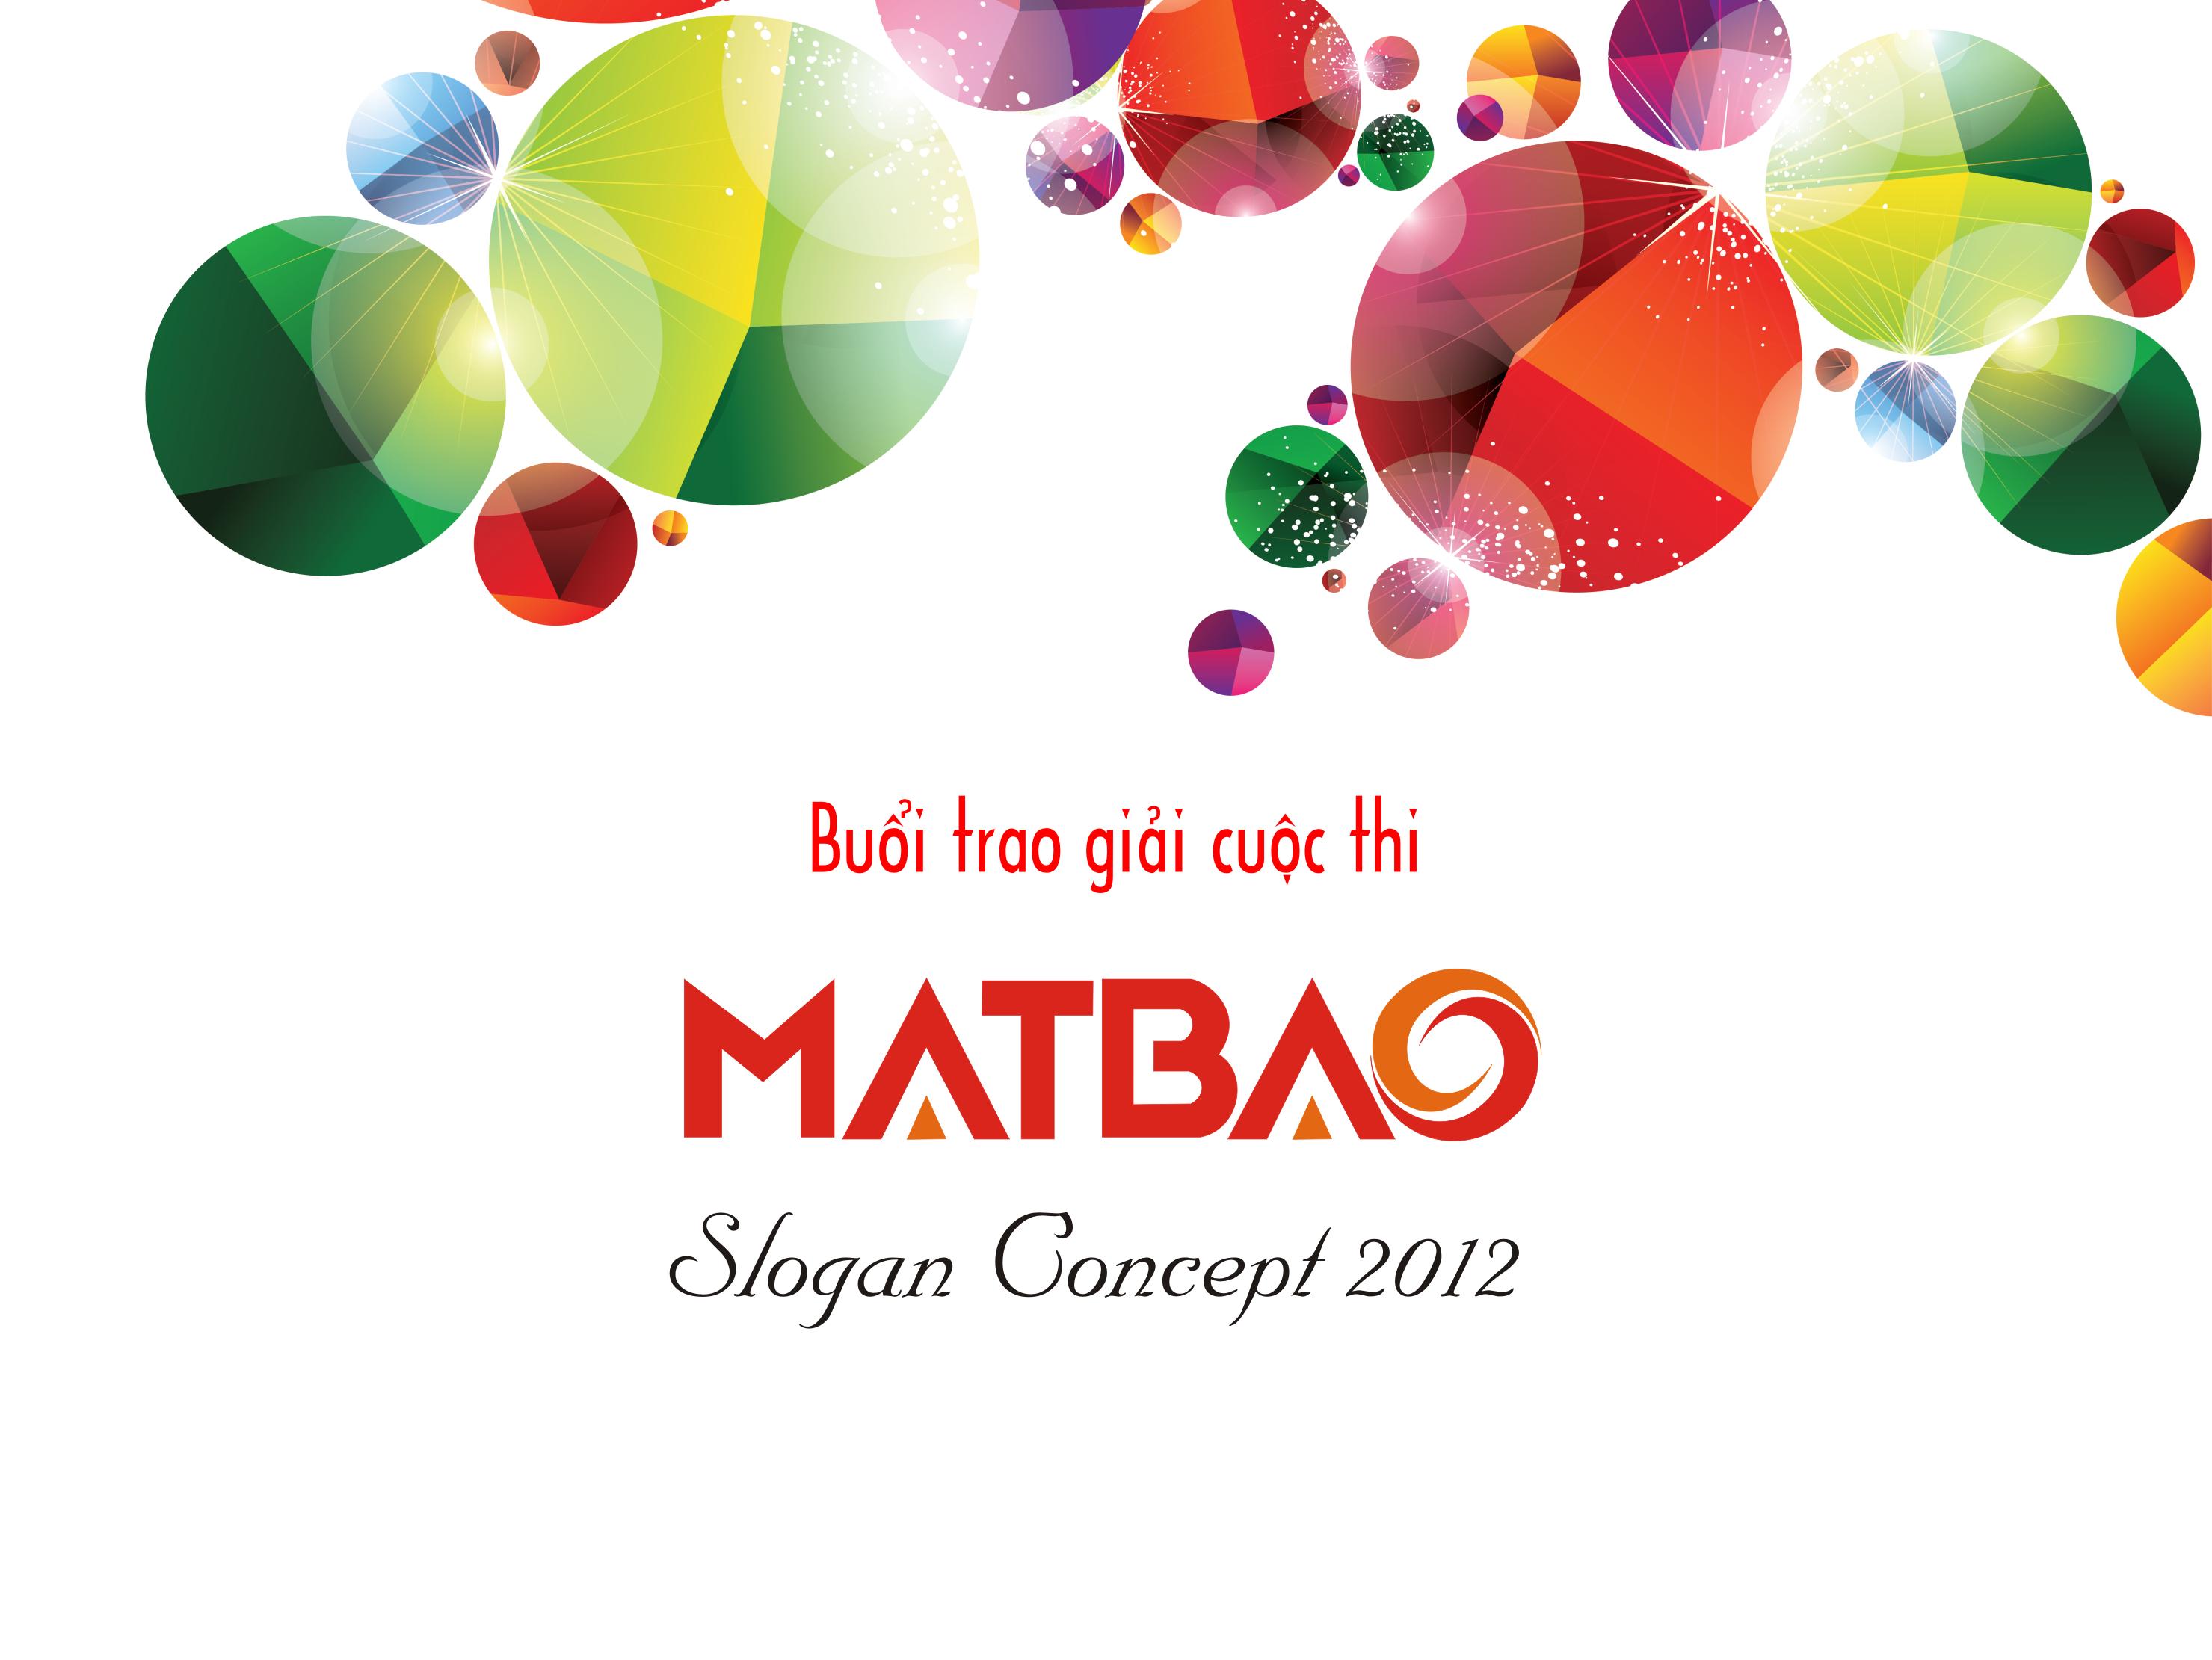 Buổi trao giải cuộc thi Mắt Bão Slogan Concept 2012